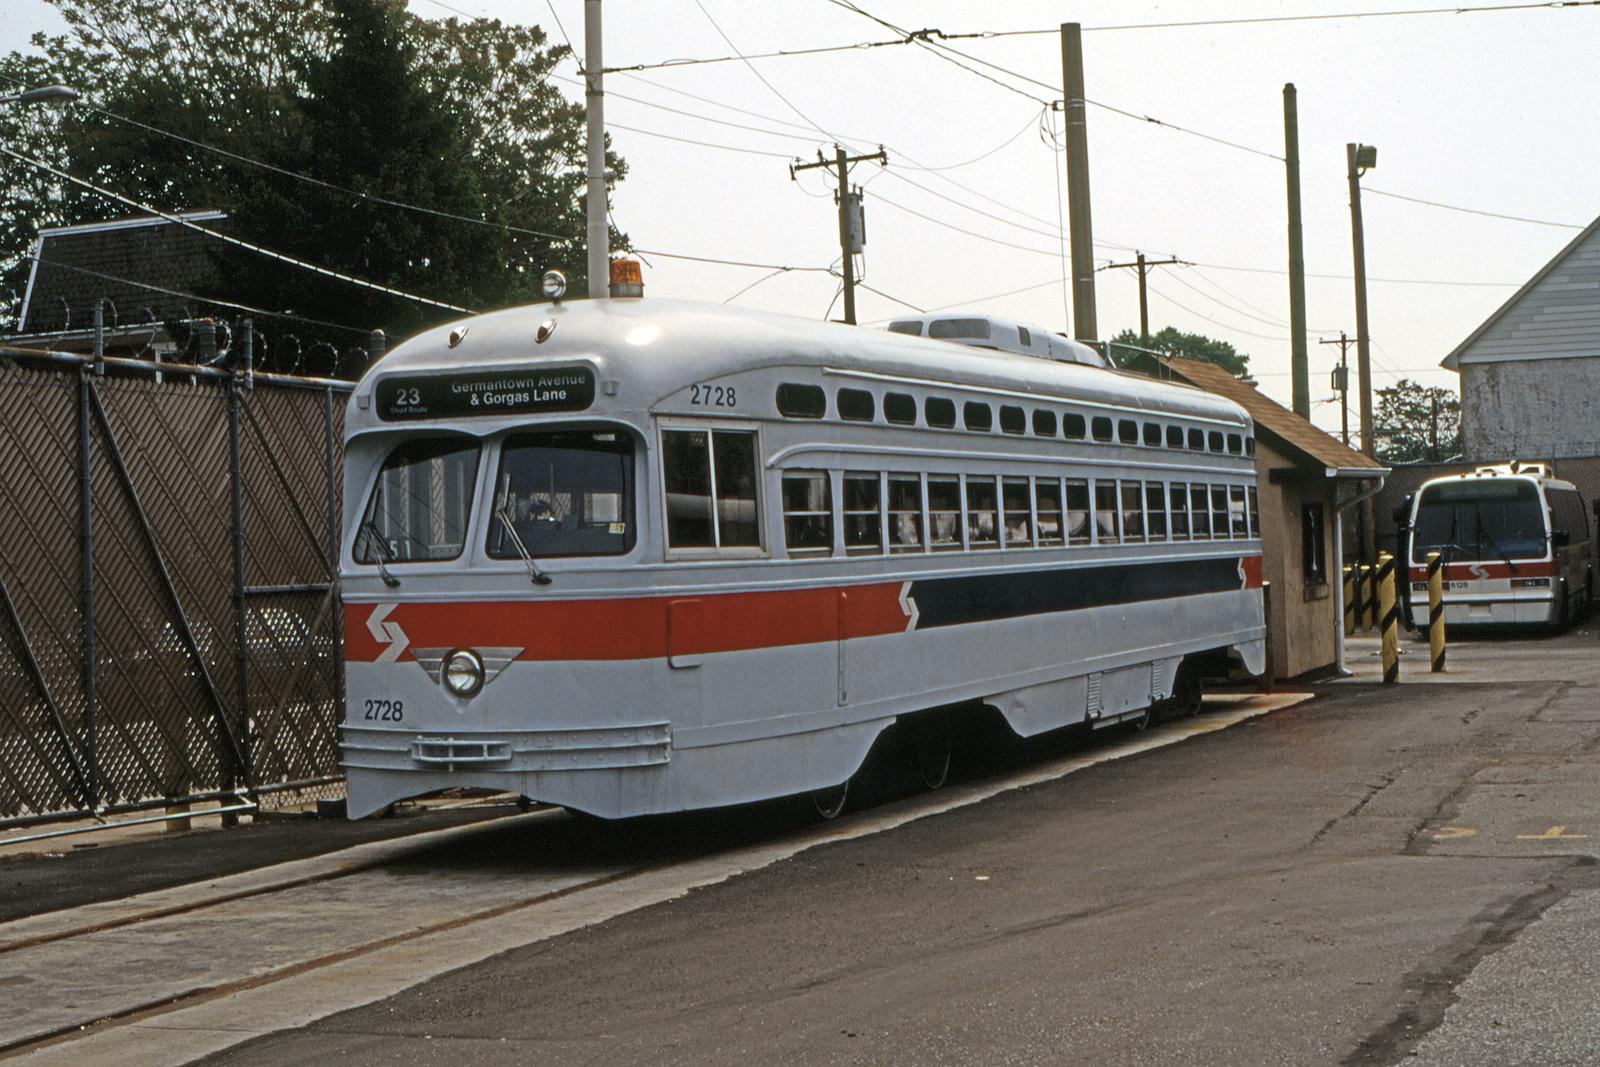 (954k, 1600x1067)<br><b>Country:</b> United States<br><b>City:</b> Philadelphia, PA<br><b>System:</b> SEPTA (or Predecessor)<br><b>Line:</b> Rt. 23-Germantown<br><b>Location:</b> Germantown Depot<br><b>Car:</b> PTC/SEPTA Postwar All-electric PCC (St.Louis, 1947) 2728 <br><b>Collection of:</b> David Pirmann<br><b>Date:</b> 5/15/1995<br><b>Viewed (this week/total):</b> 1 / 98